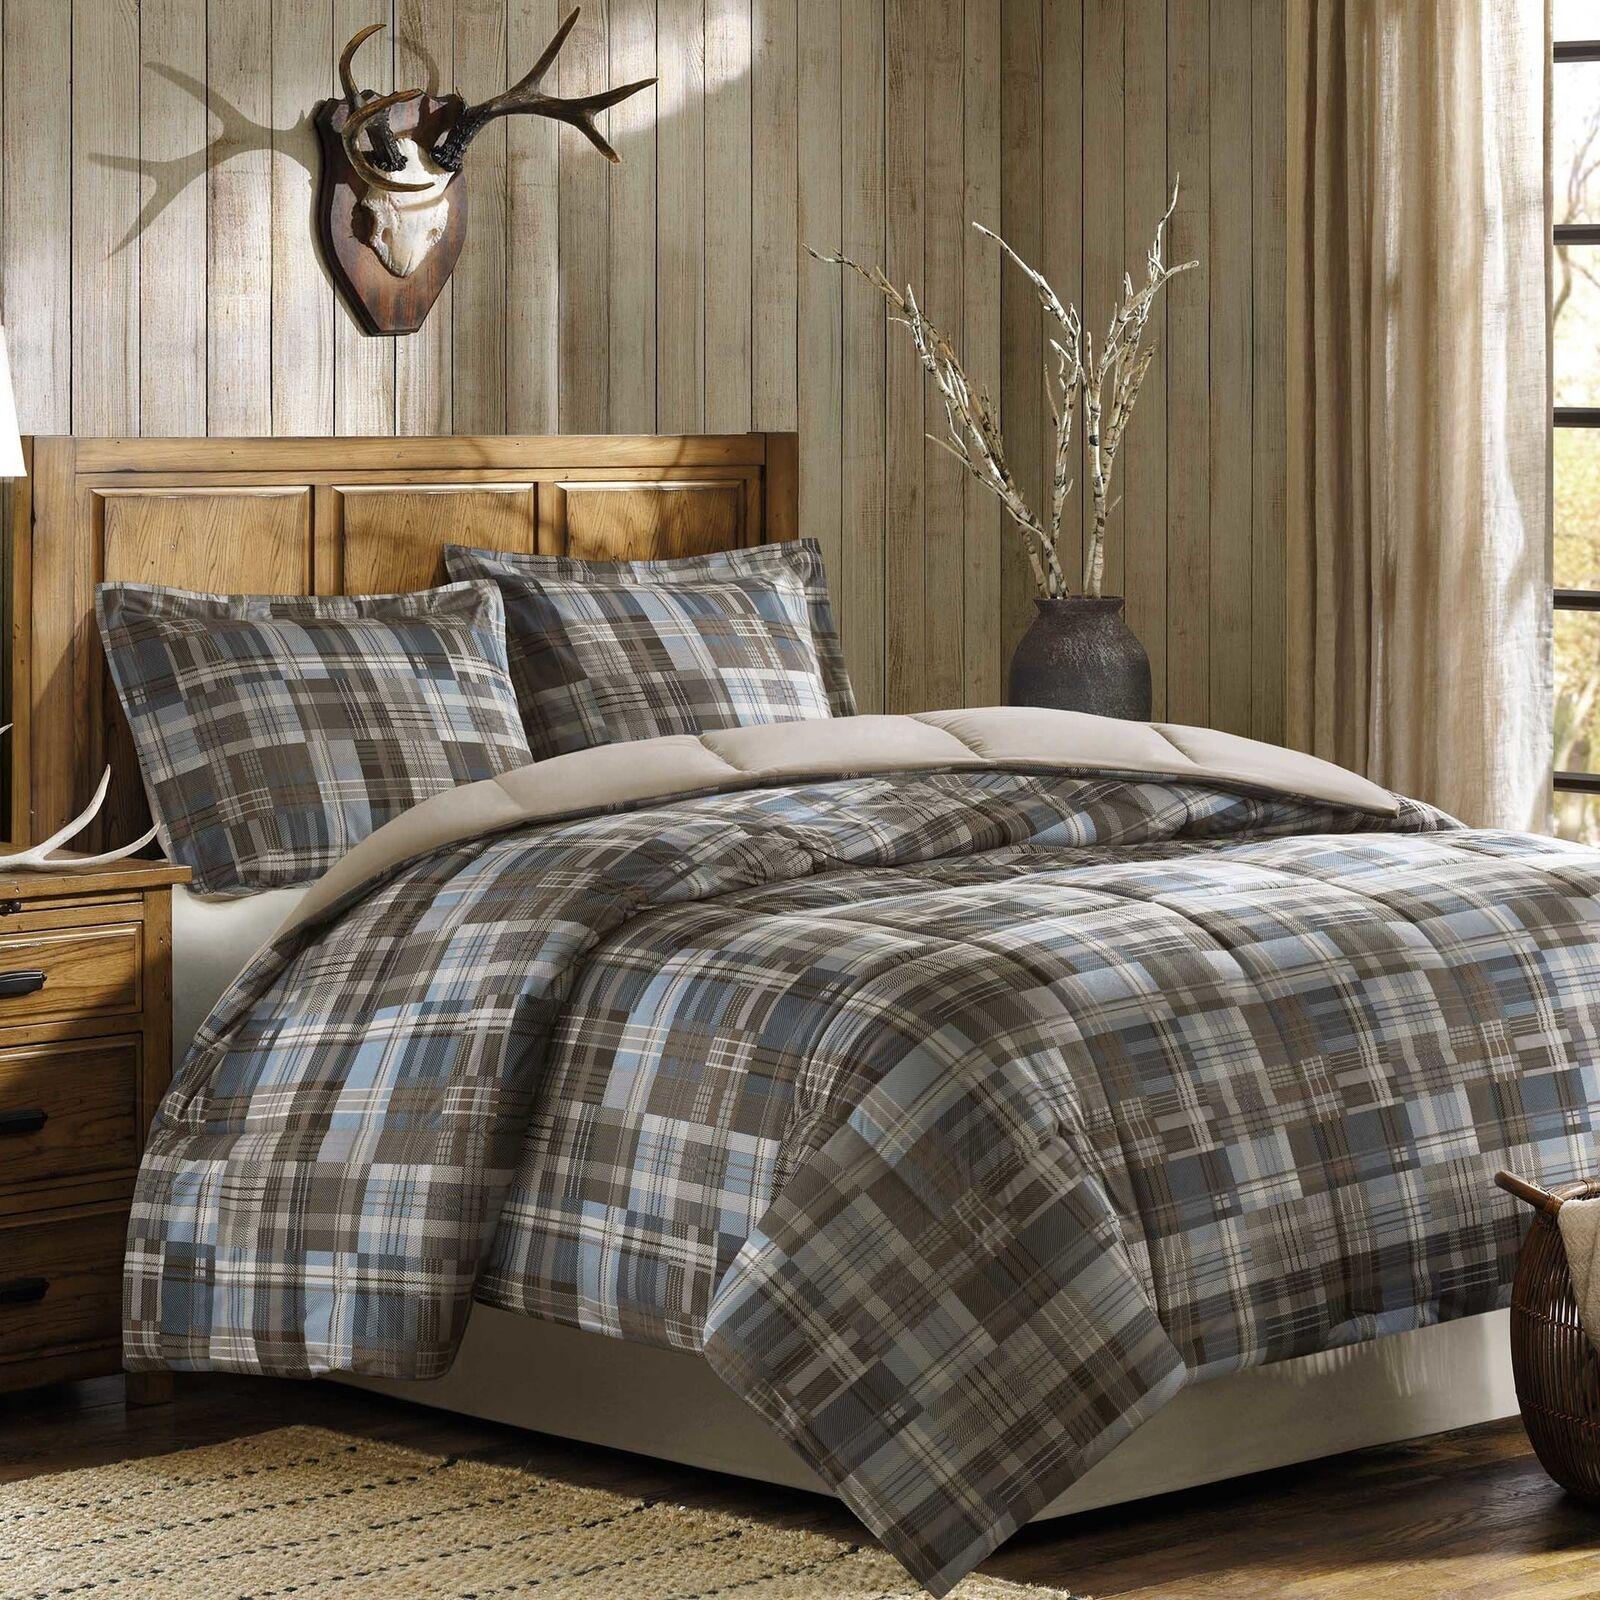 Woolrich White River Down Alternative Reversible Comforter Mini Set